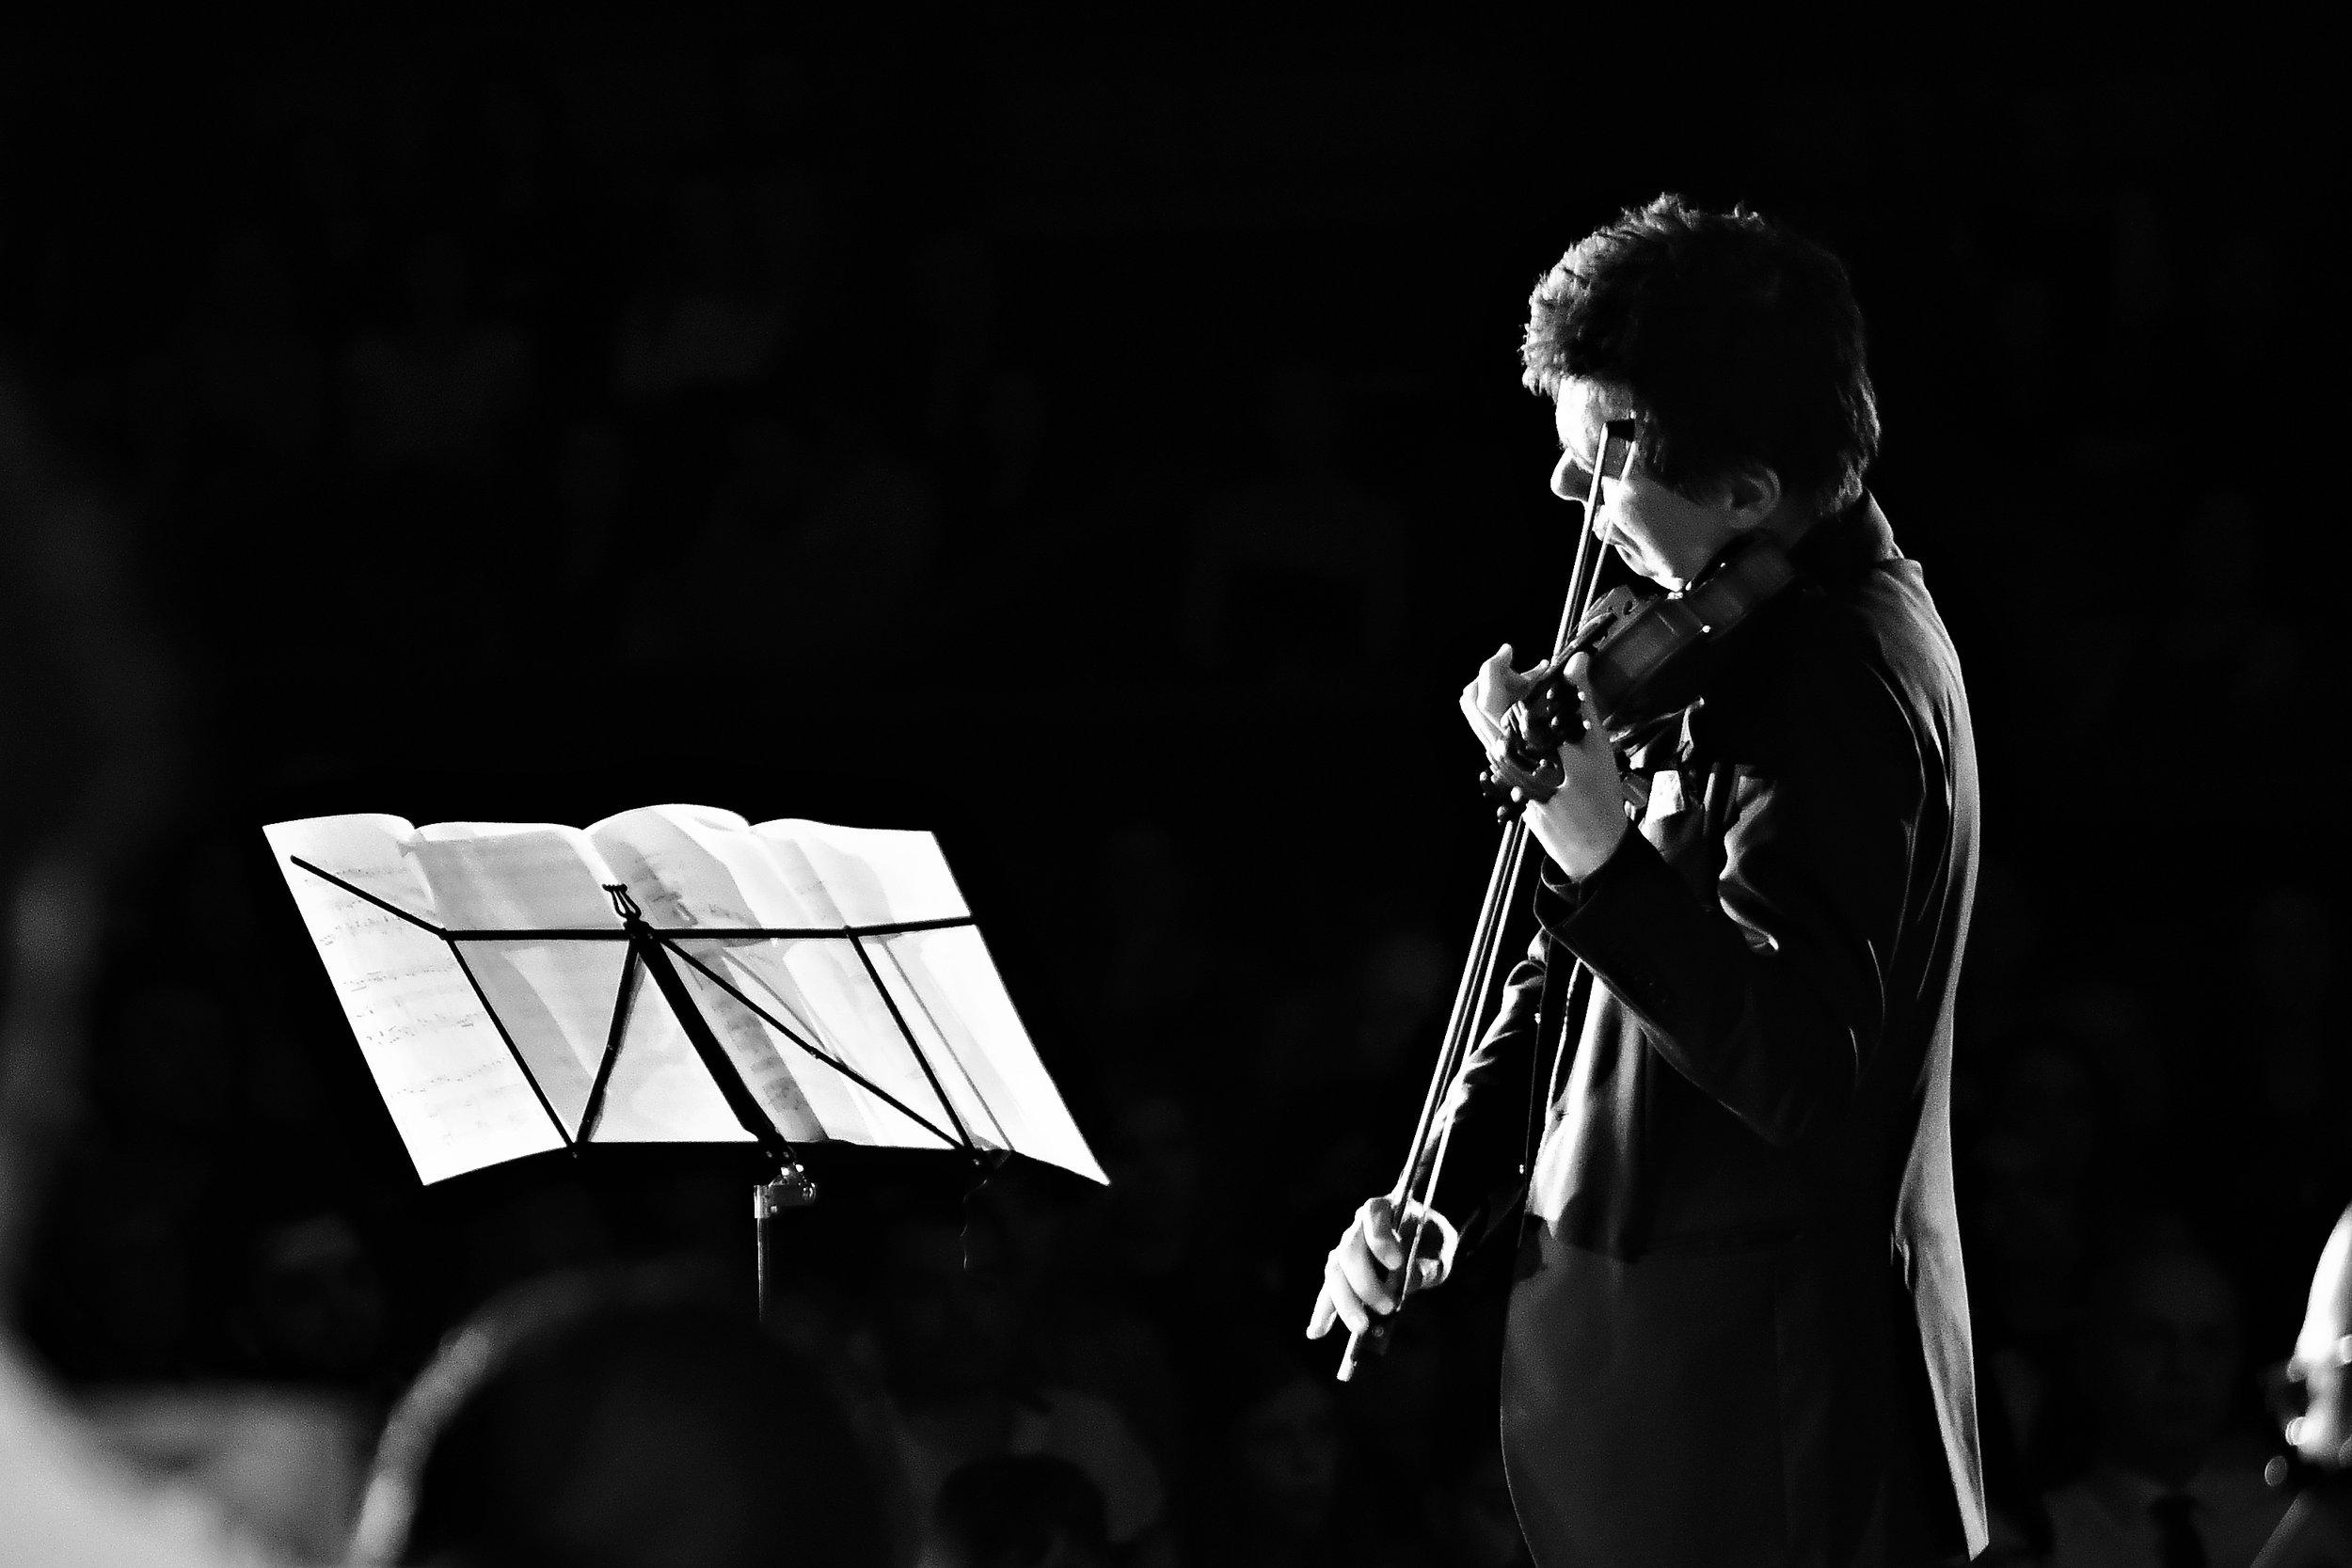 Alexandru Tomescu_Hope Concert 2018_01_Foto The Storyalist.JPG